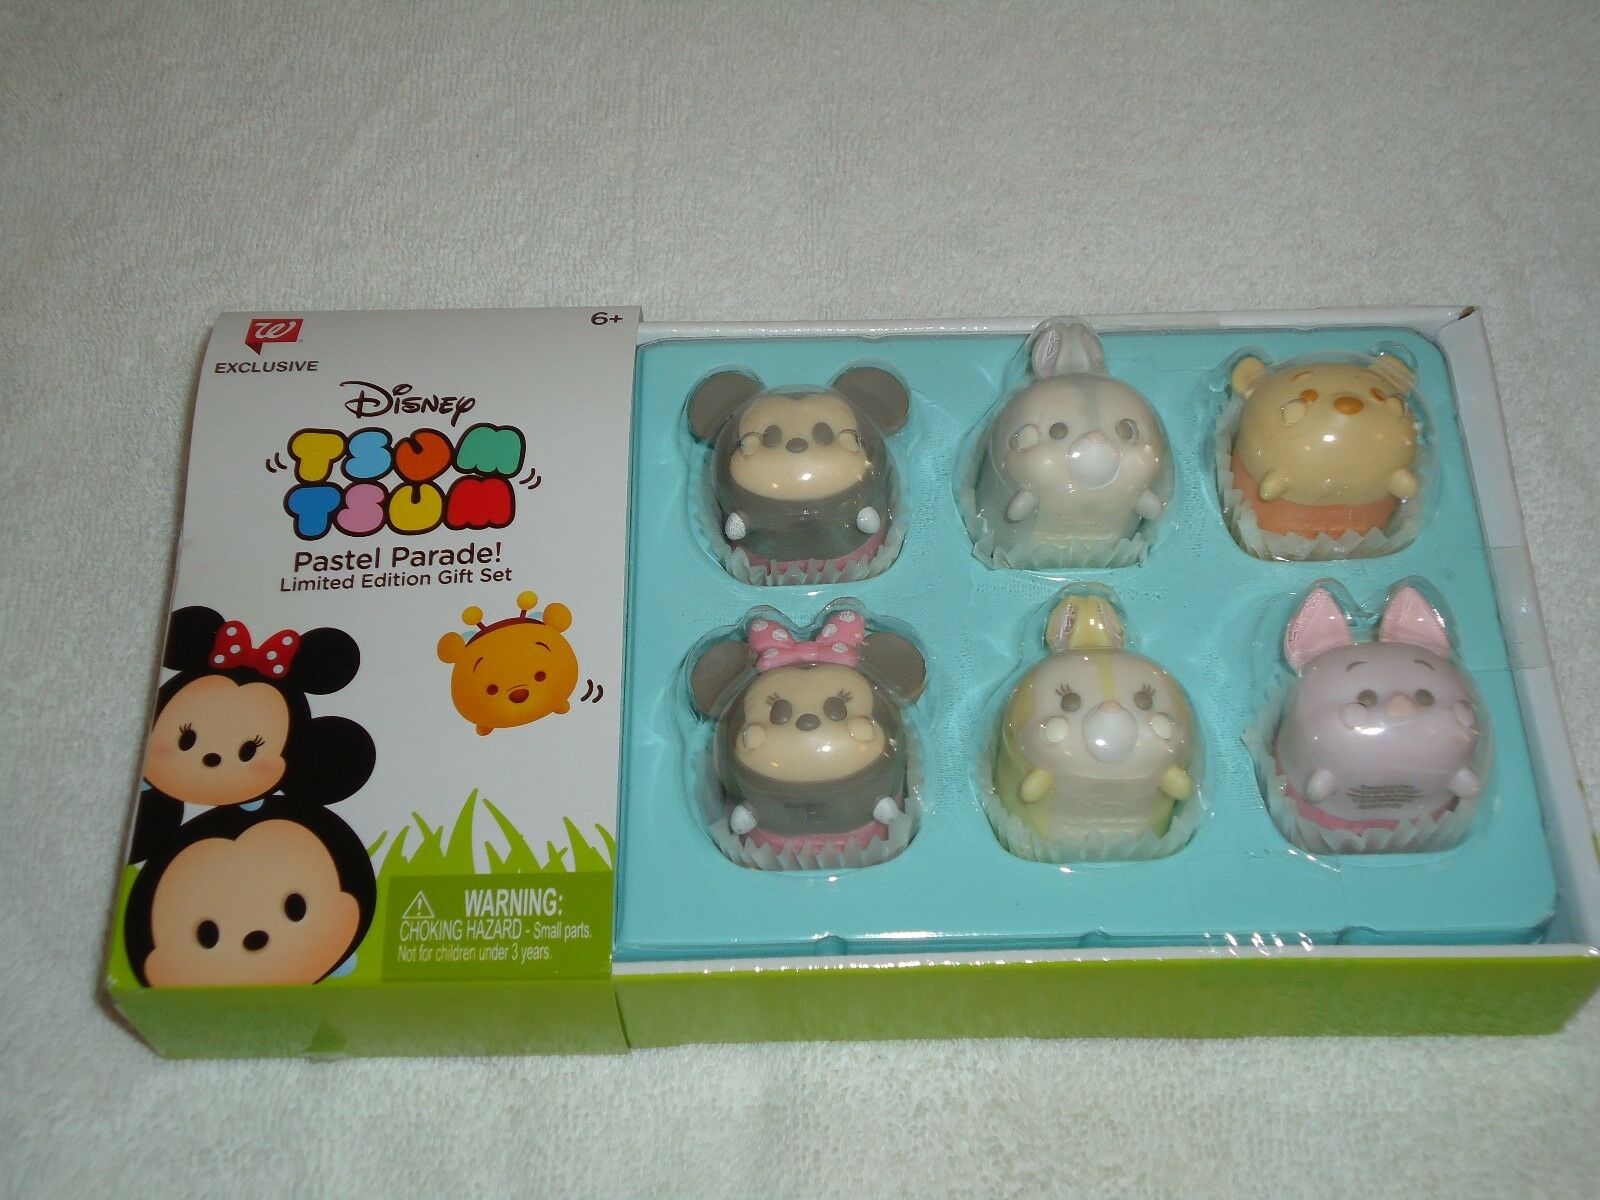 Disney Tsum Tsum Pastel Parade Limited Edition Gift Set - NE